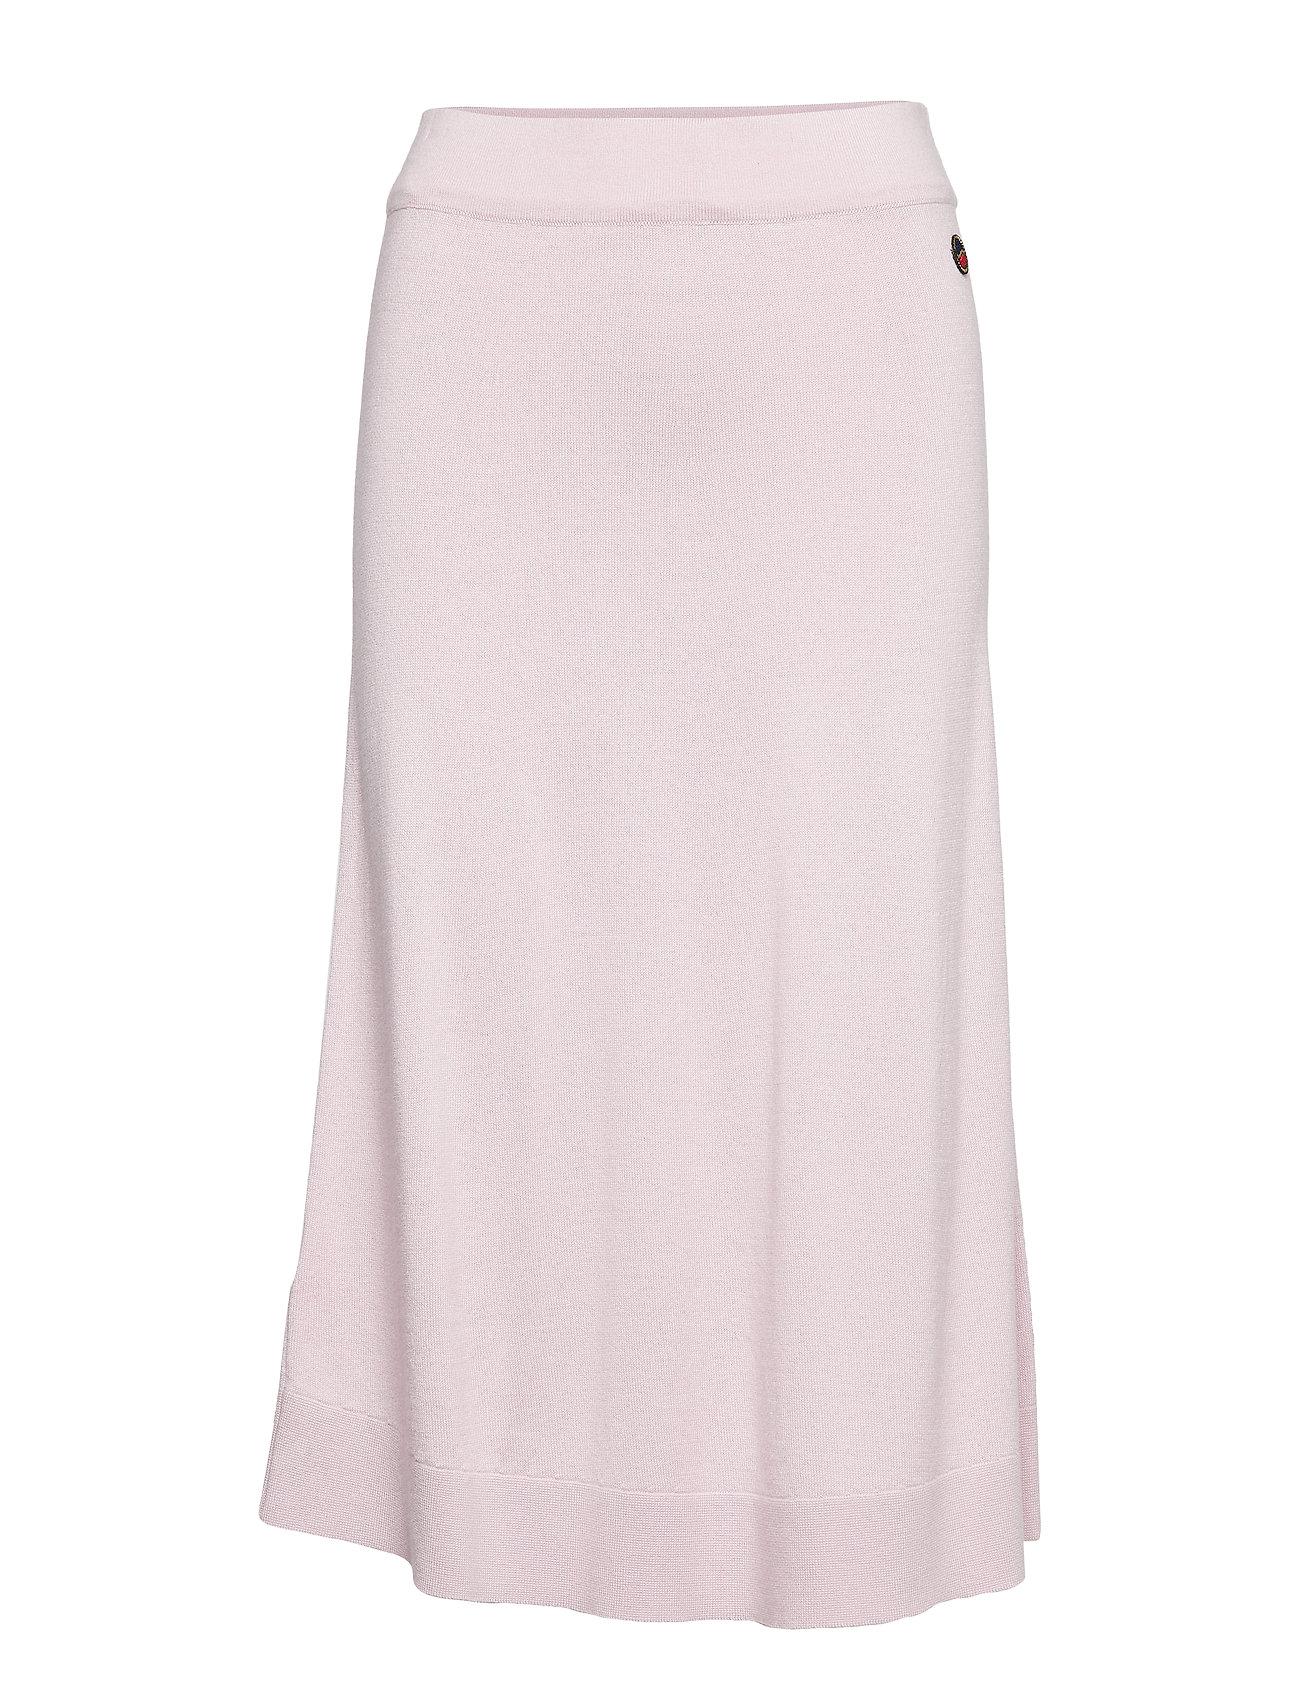 BUSNEL Mina skirt - BLUSH PINK